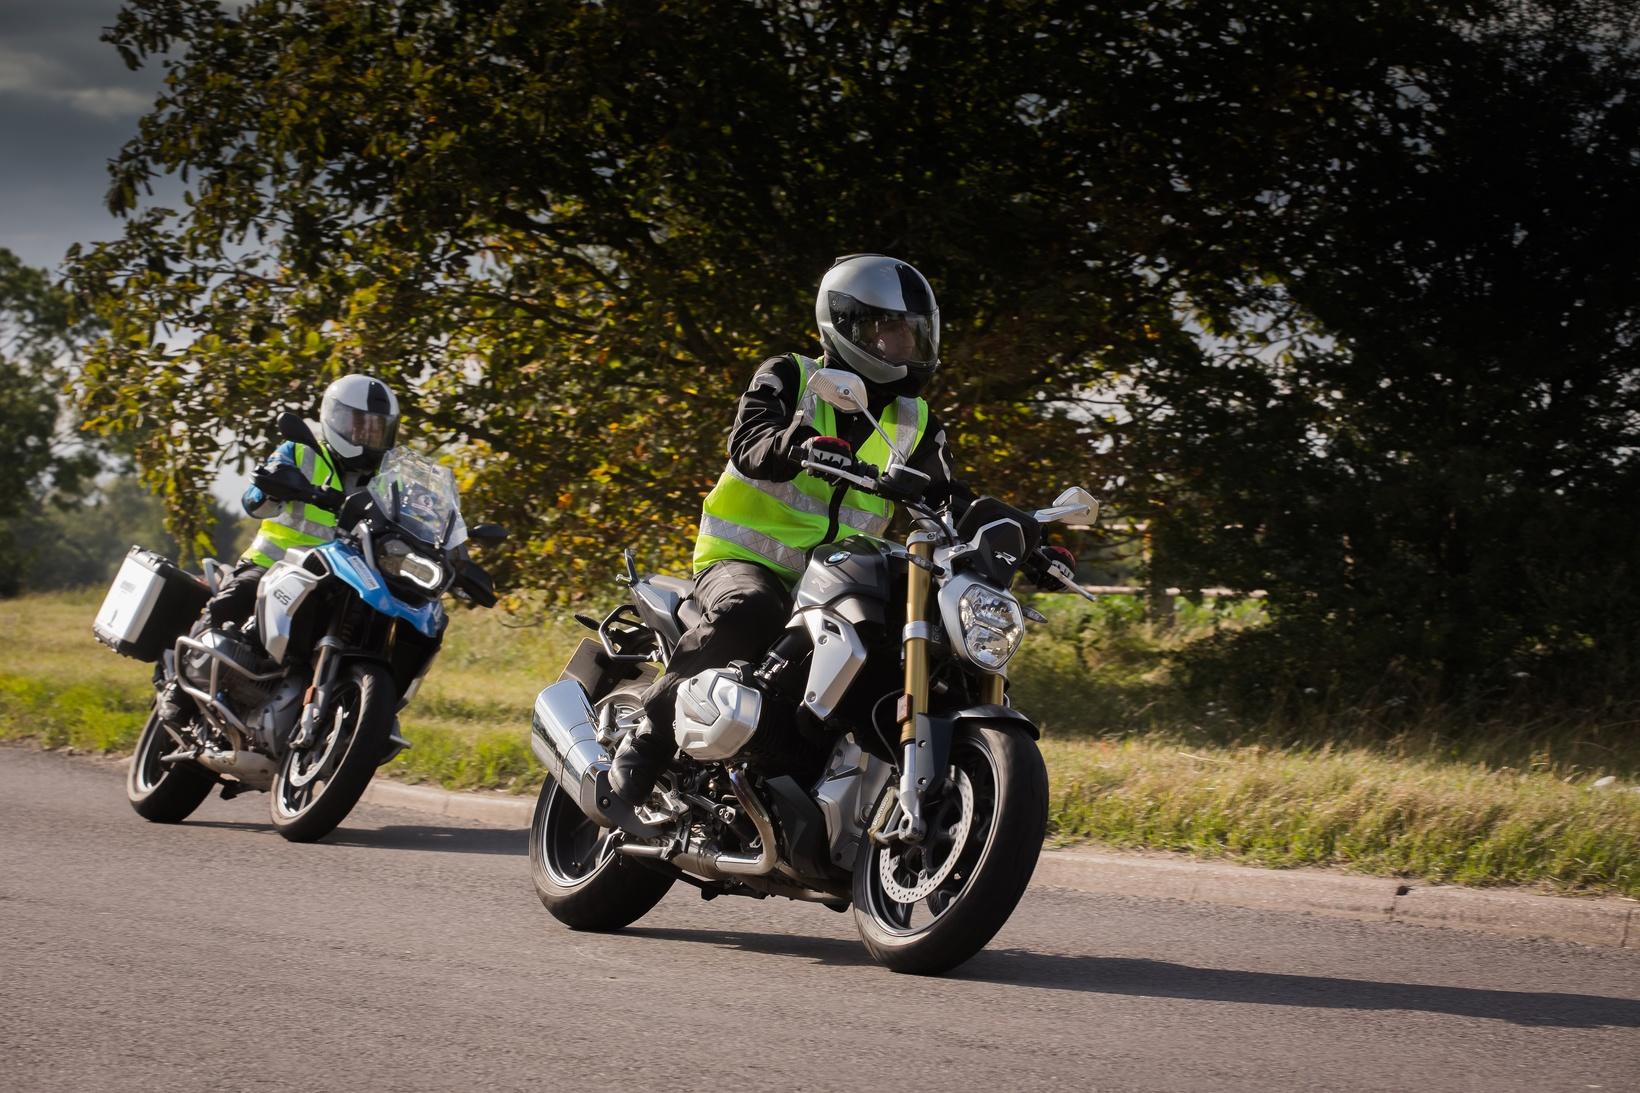 Take your riding skills further